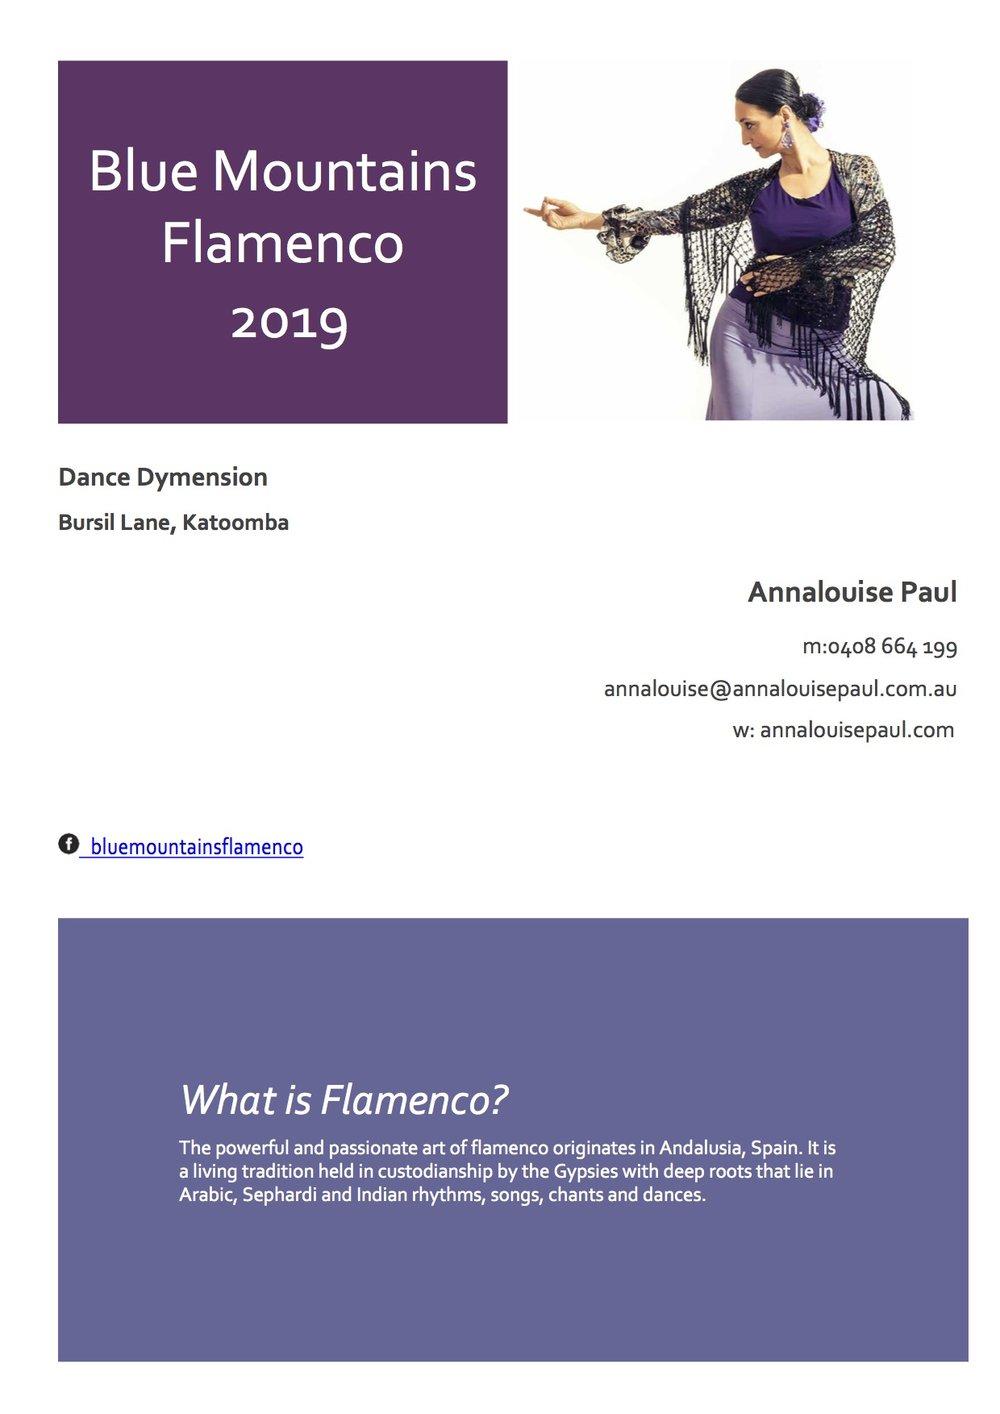 Blue Mountains Flamenco COVER 2019 WEB.jpg